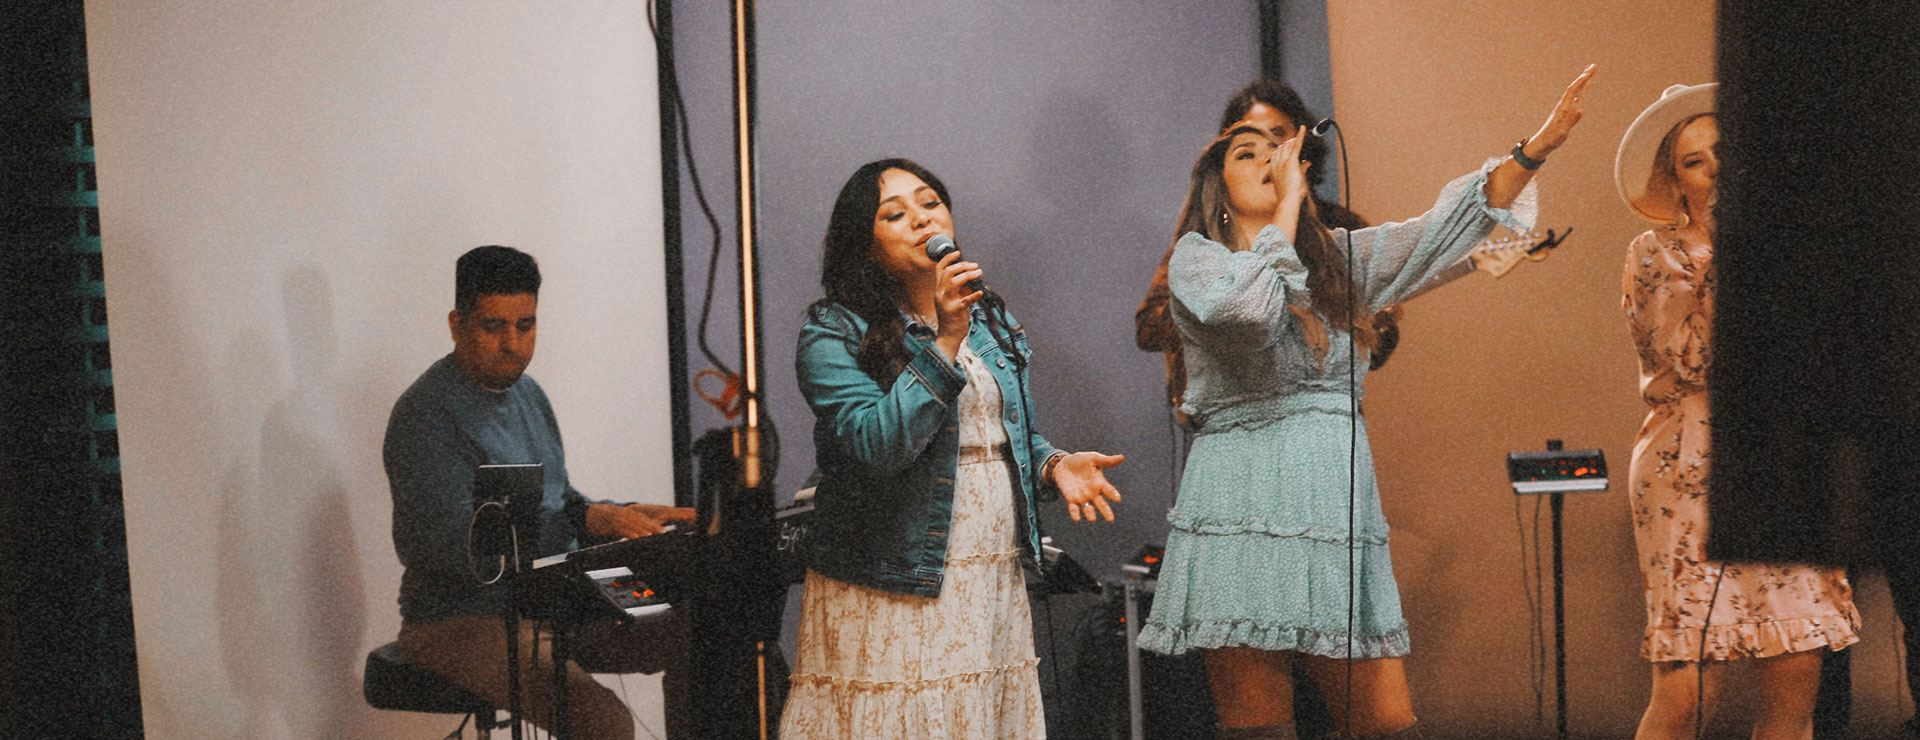 Live Worship in Costa Mesa